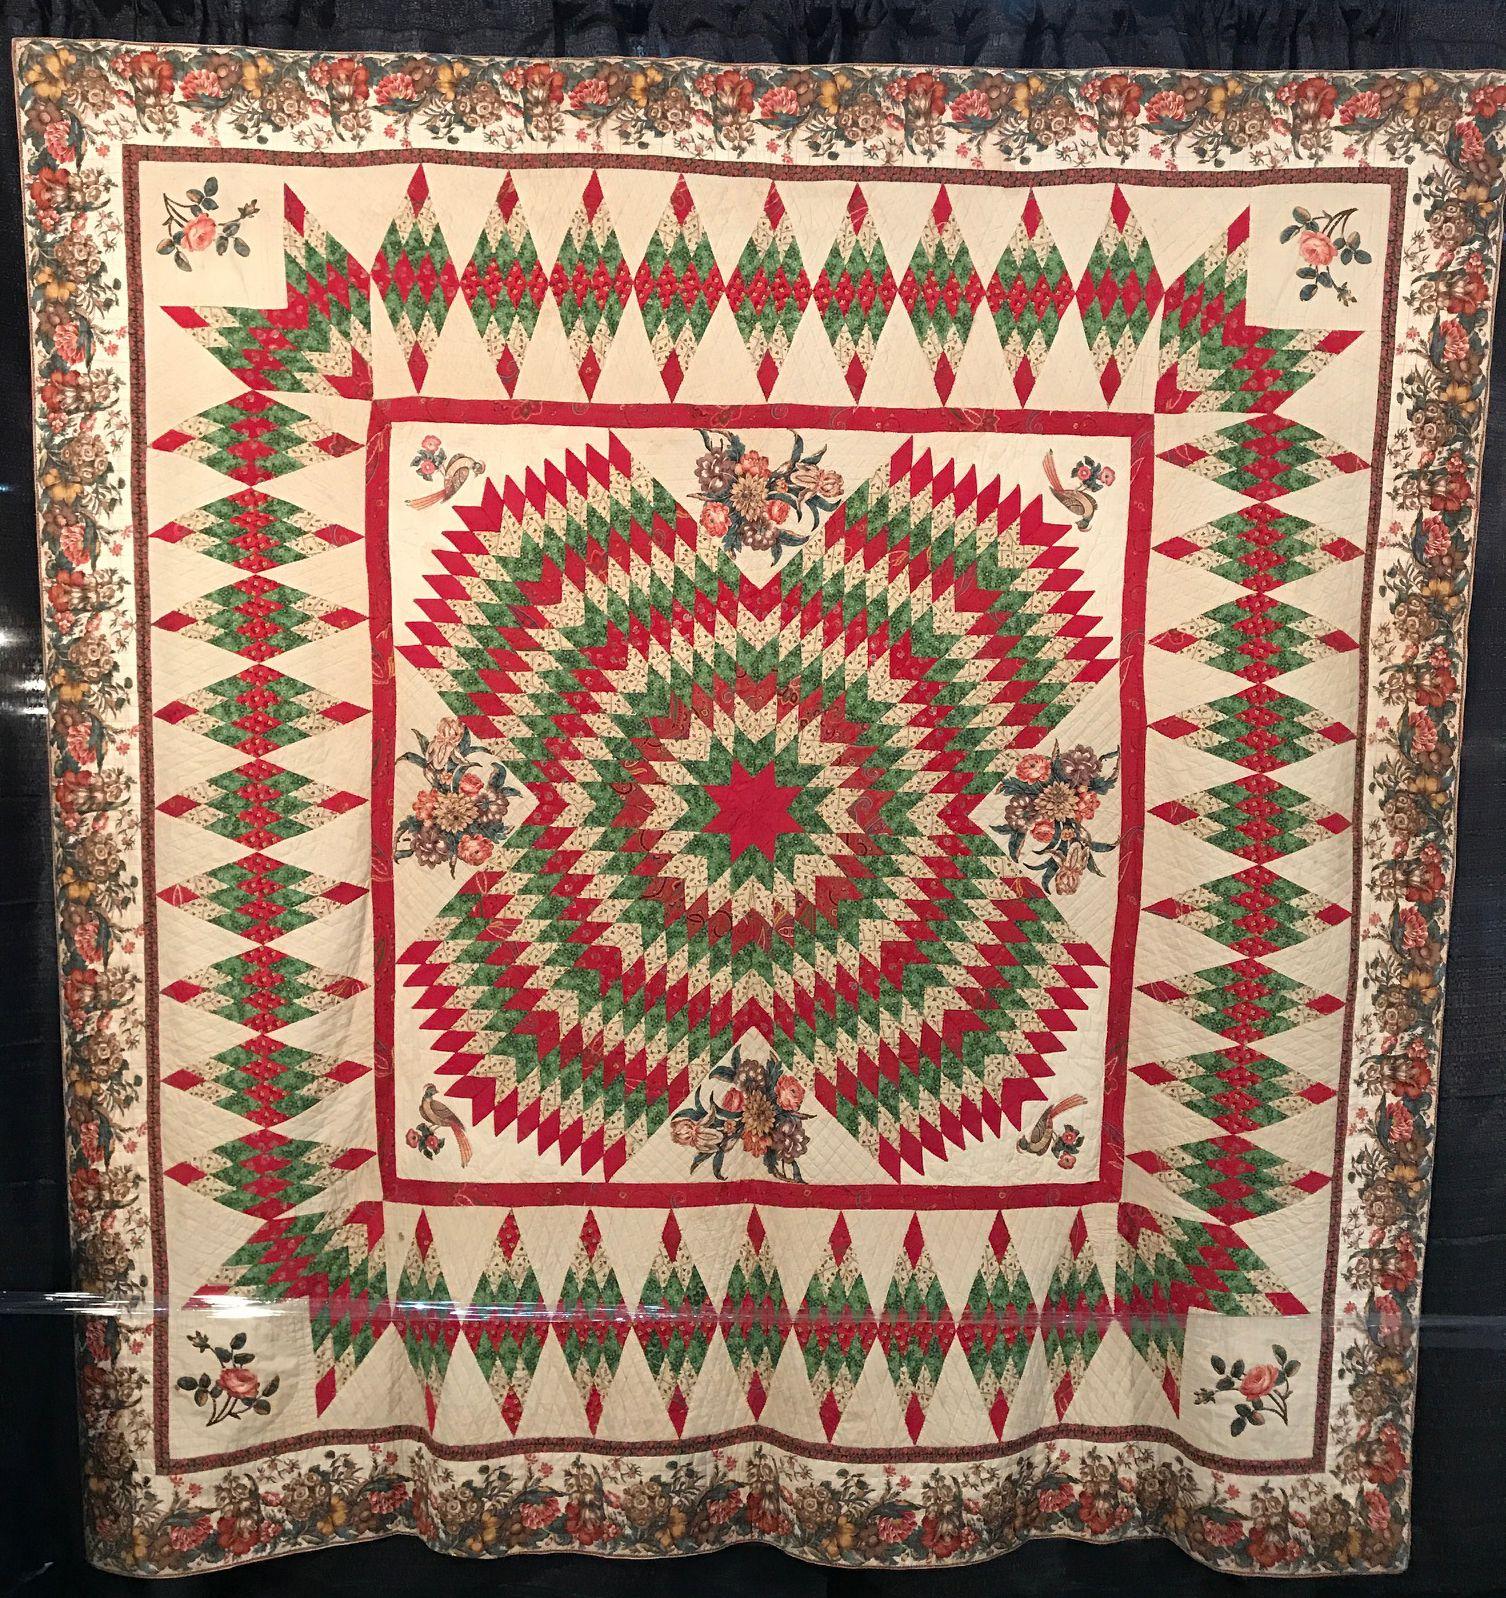 Humble Quilts | Antique Star Quilts | Pinterest | Star quilts ... : humble quilts - Adamdwight.com